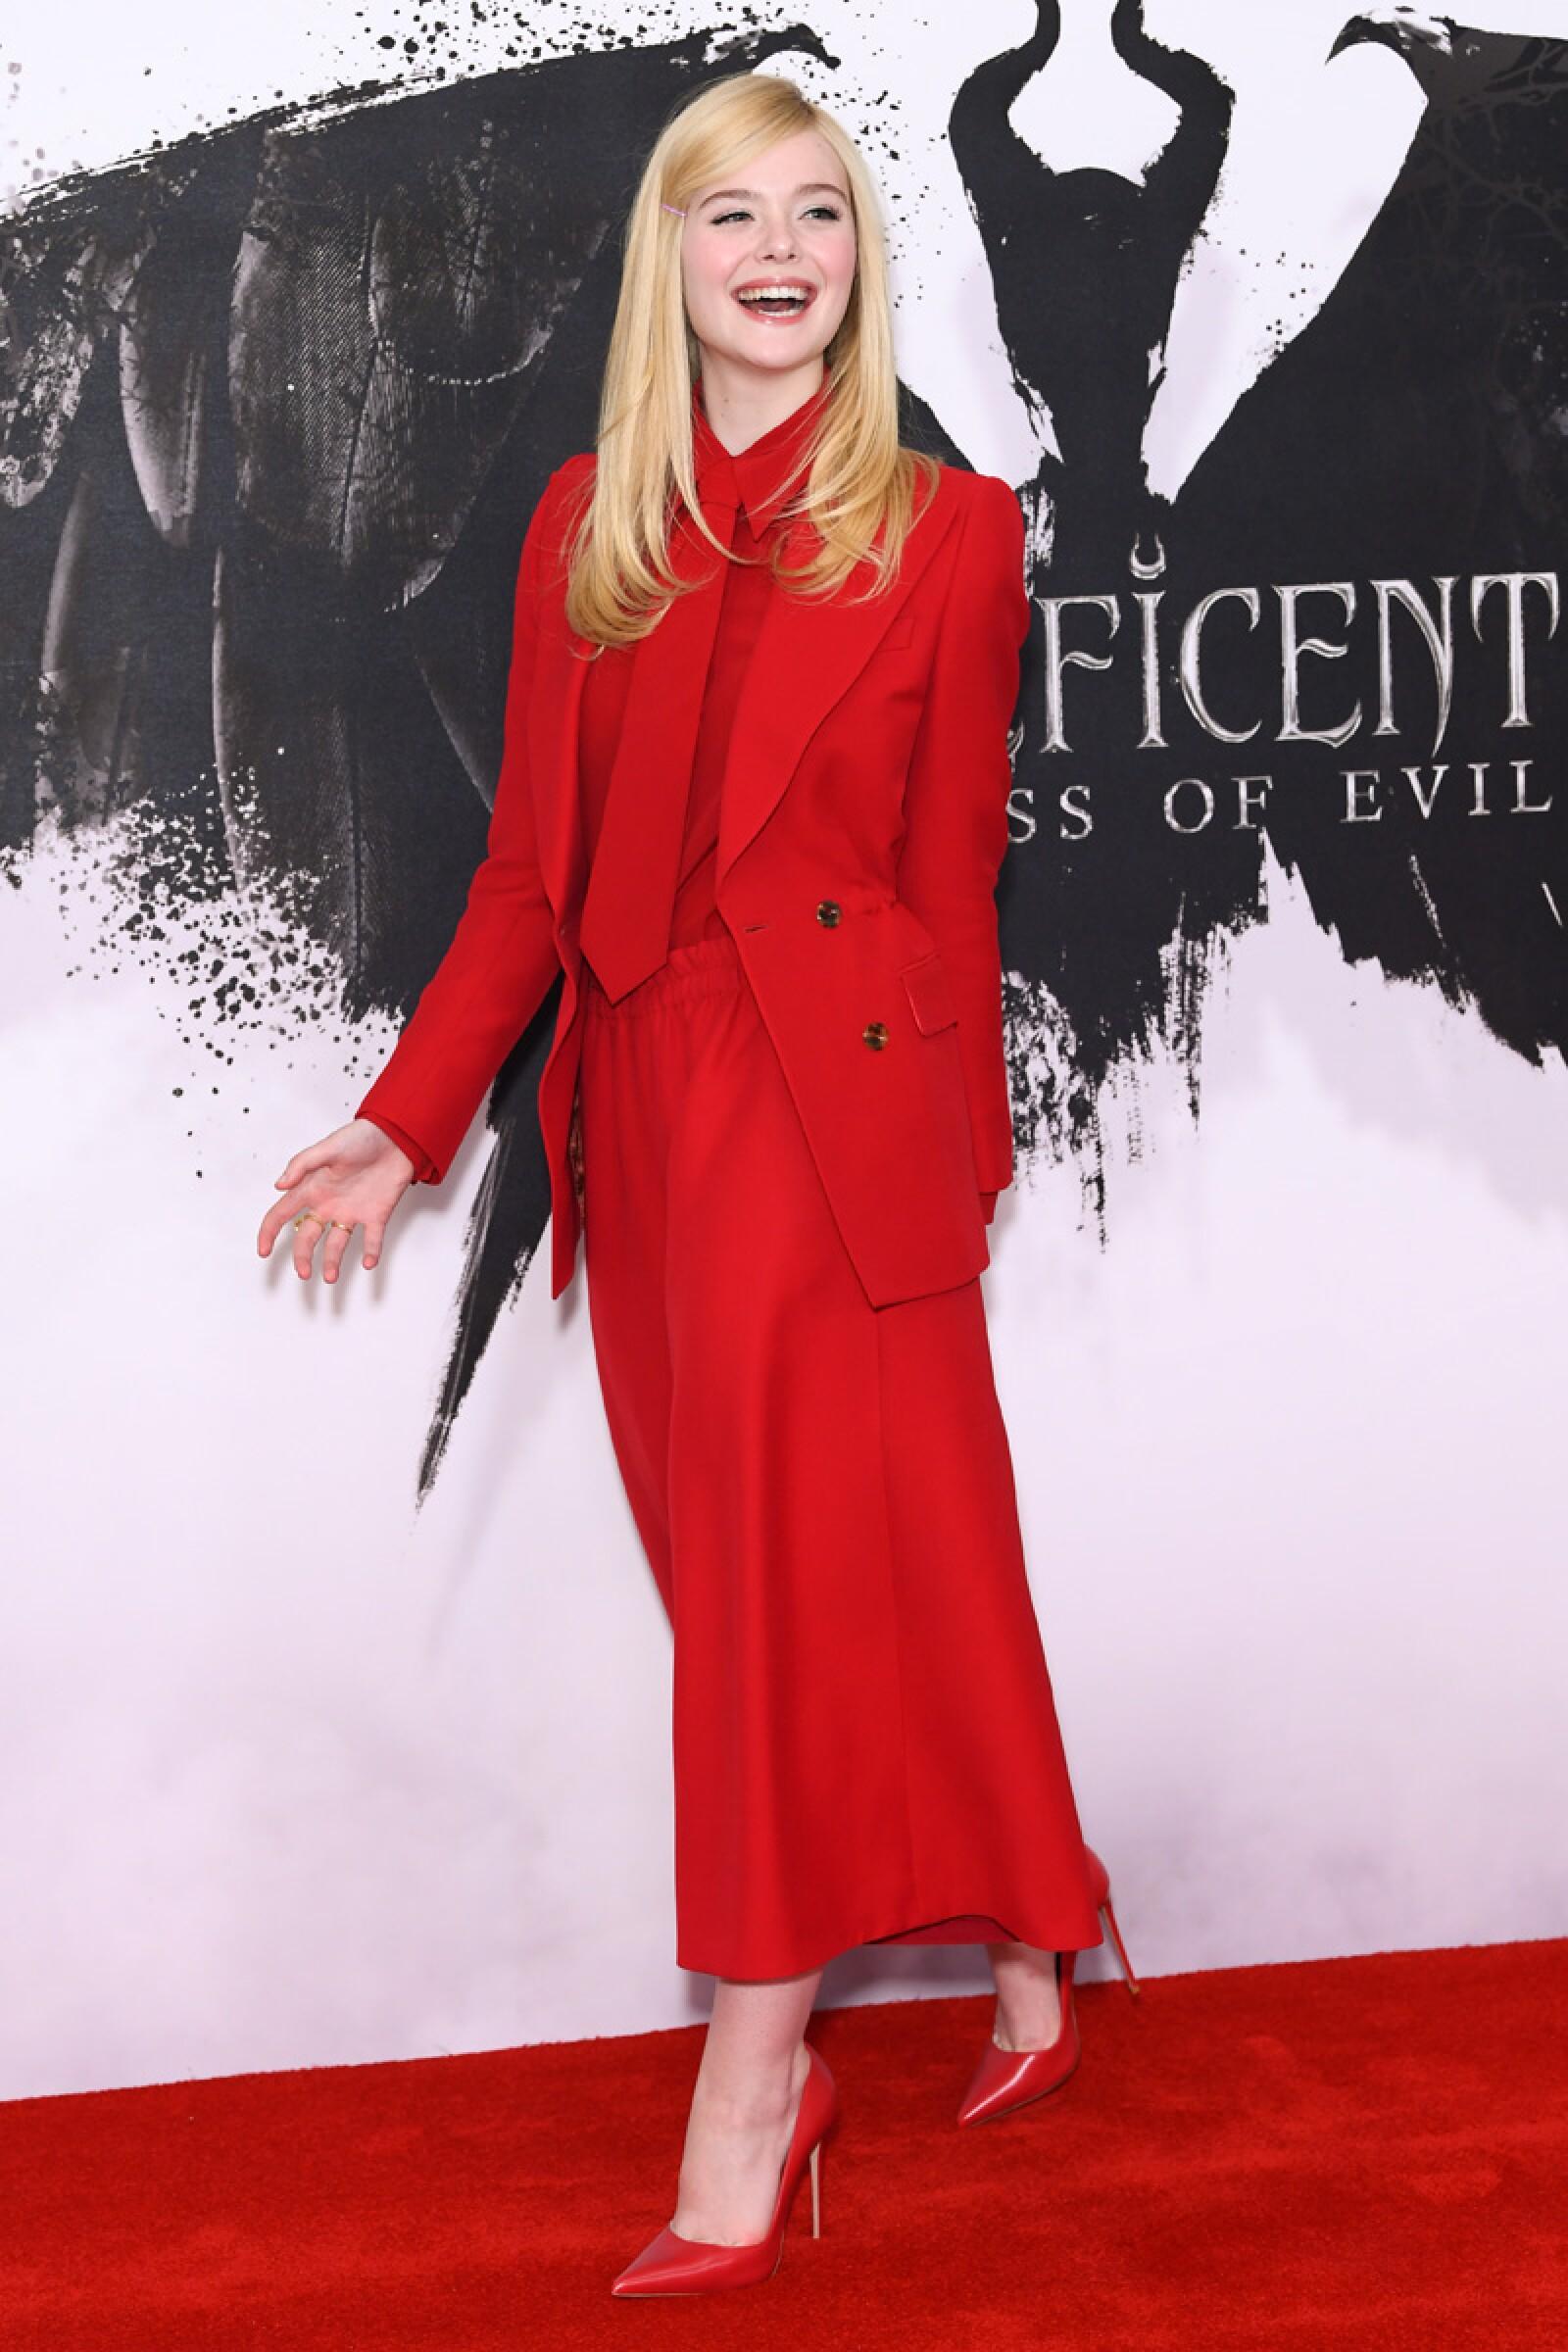 'Maleficent: Mistress of Evil' film photocall, London, UK - 10 Oct 2019